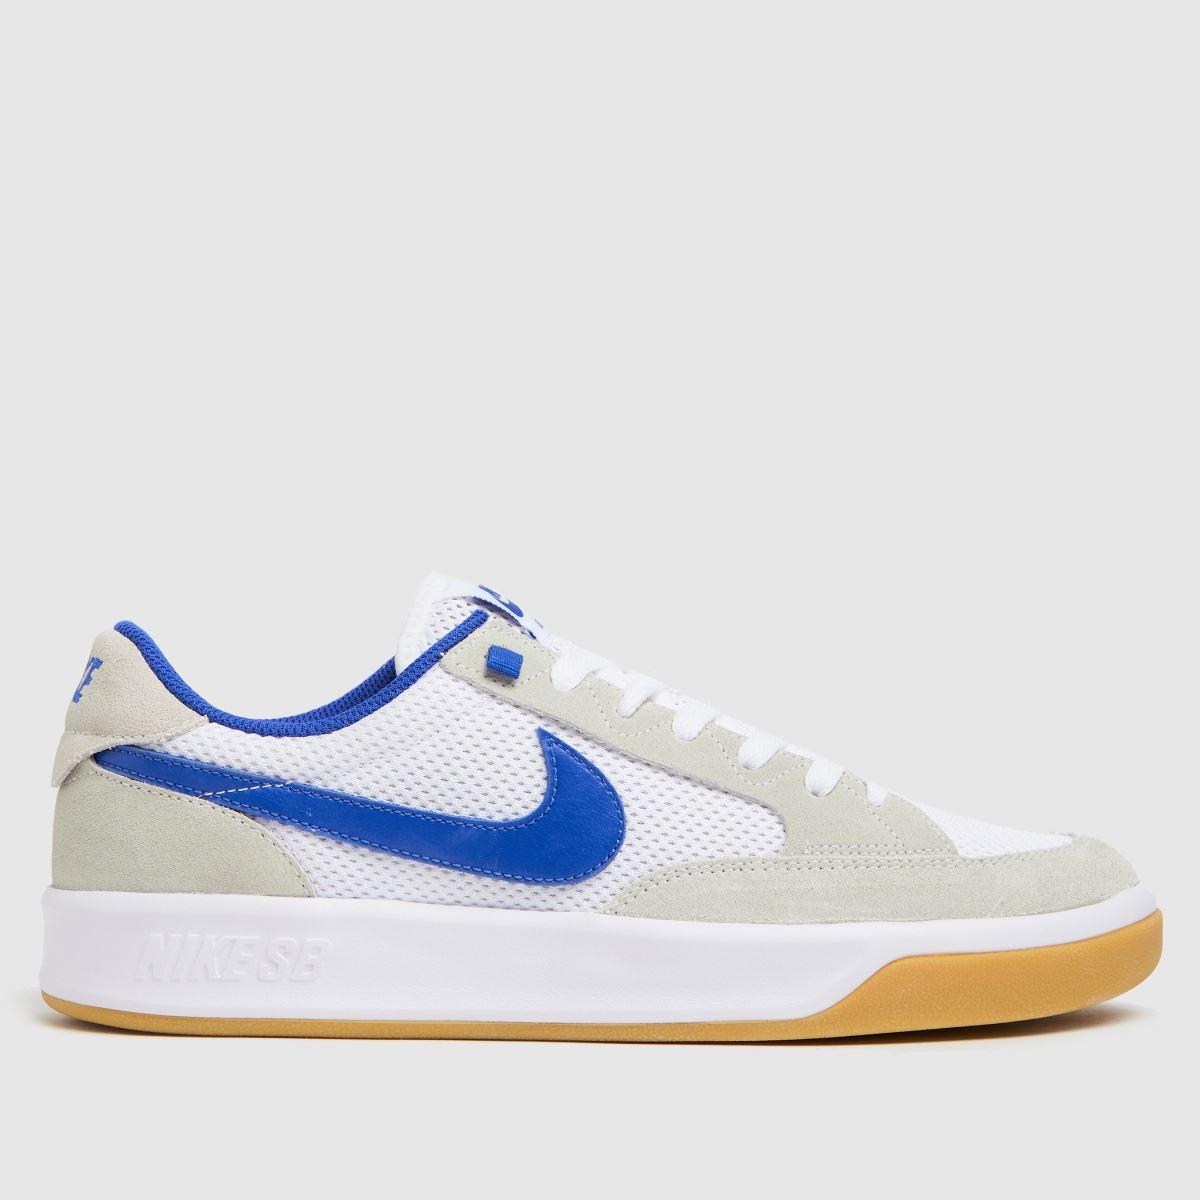 Nike SB White & Blue Adversary Trainers